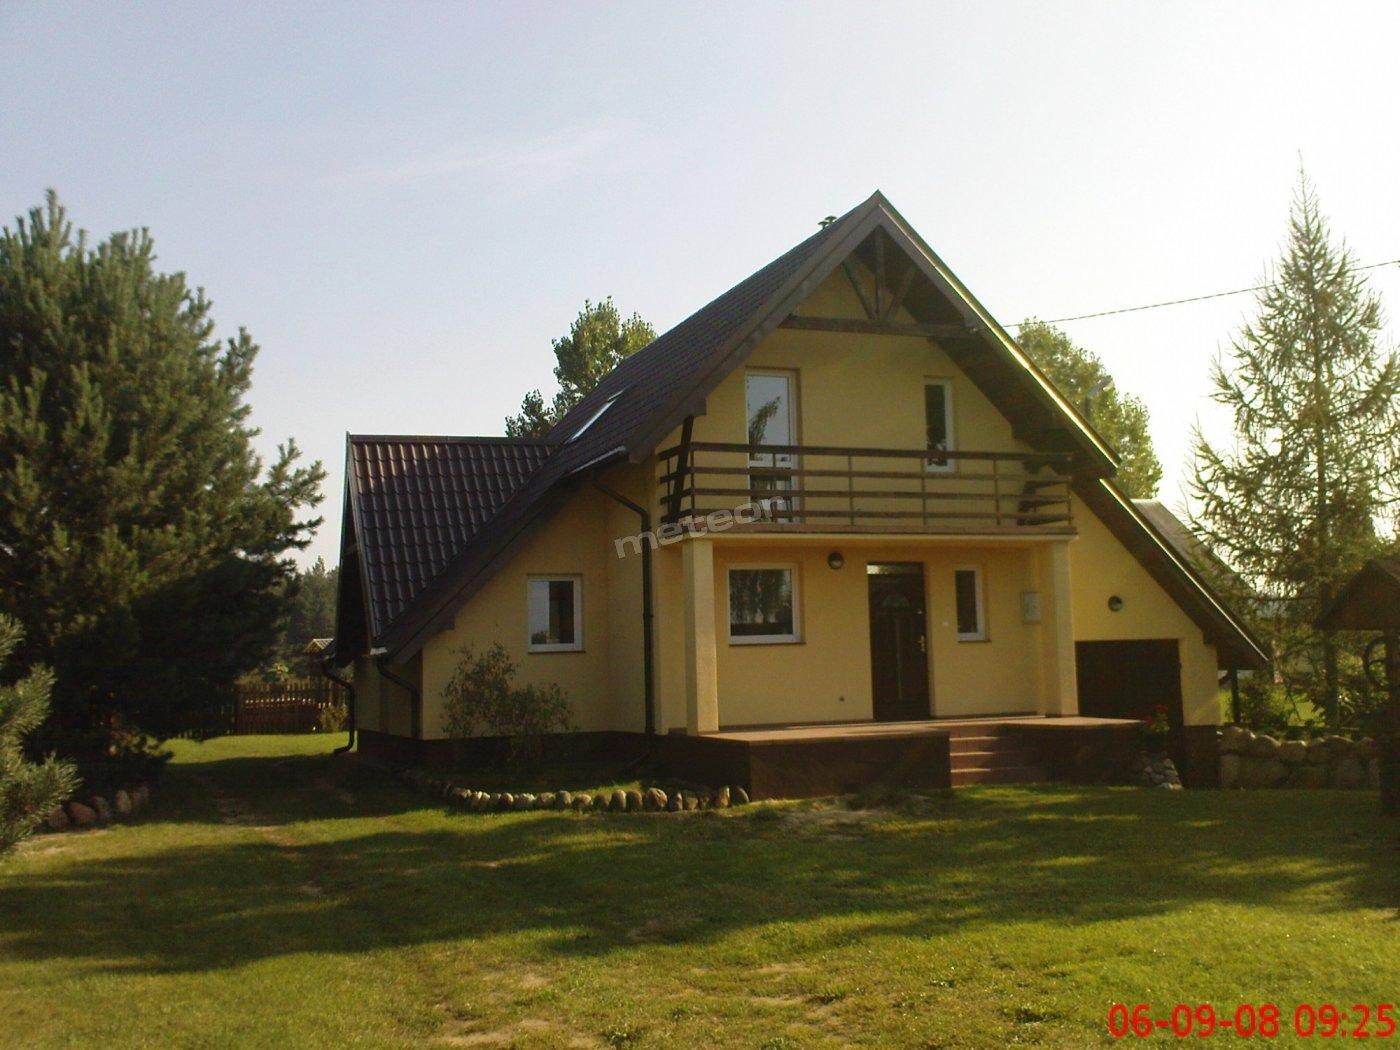 Dom Letniskowy Pod Sosnami